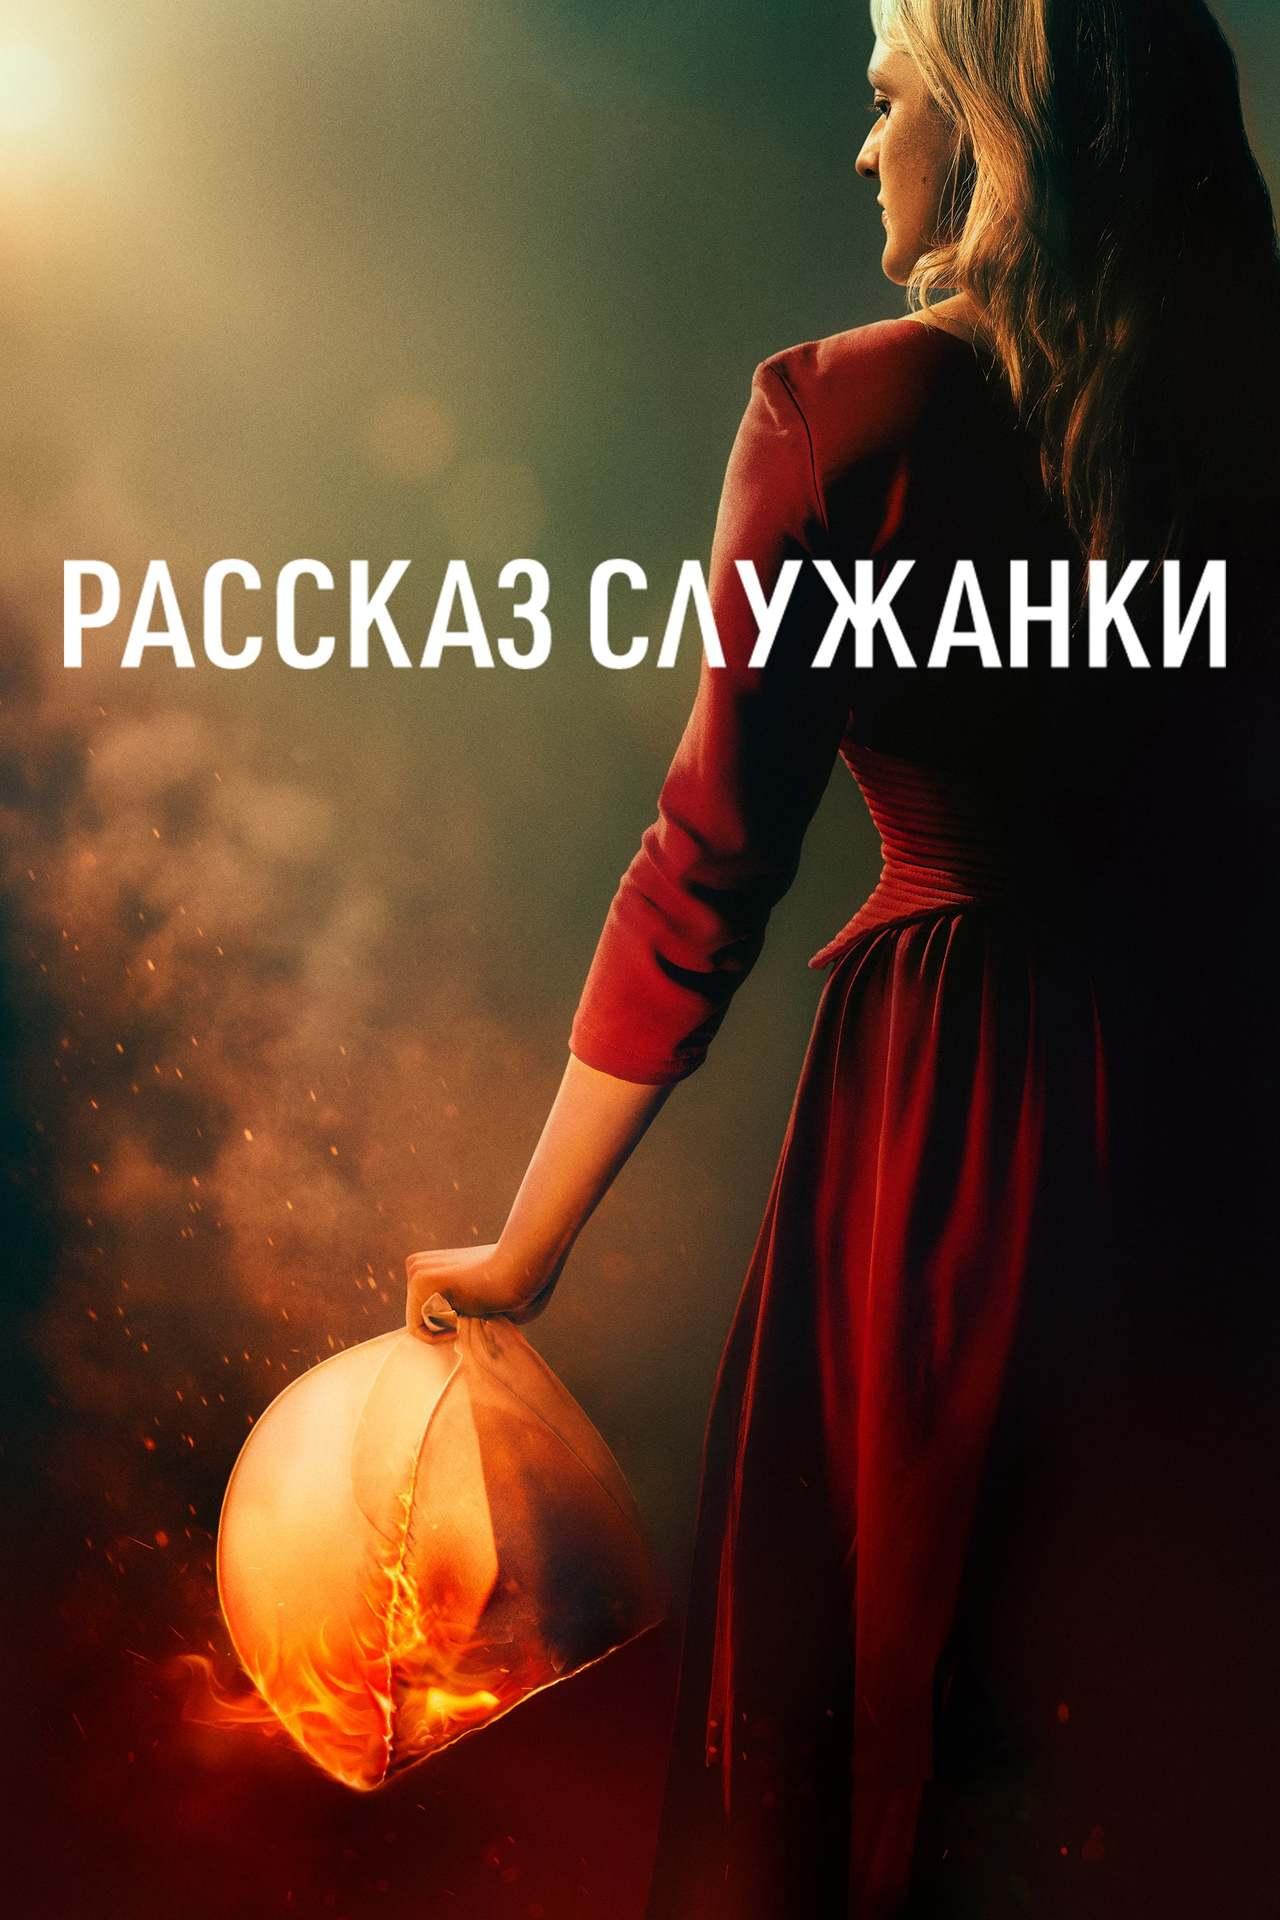 Постер фильма Рассказ служанки The Handmaid's Tale 2017